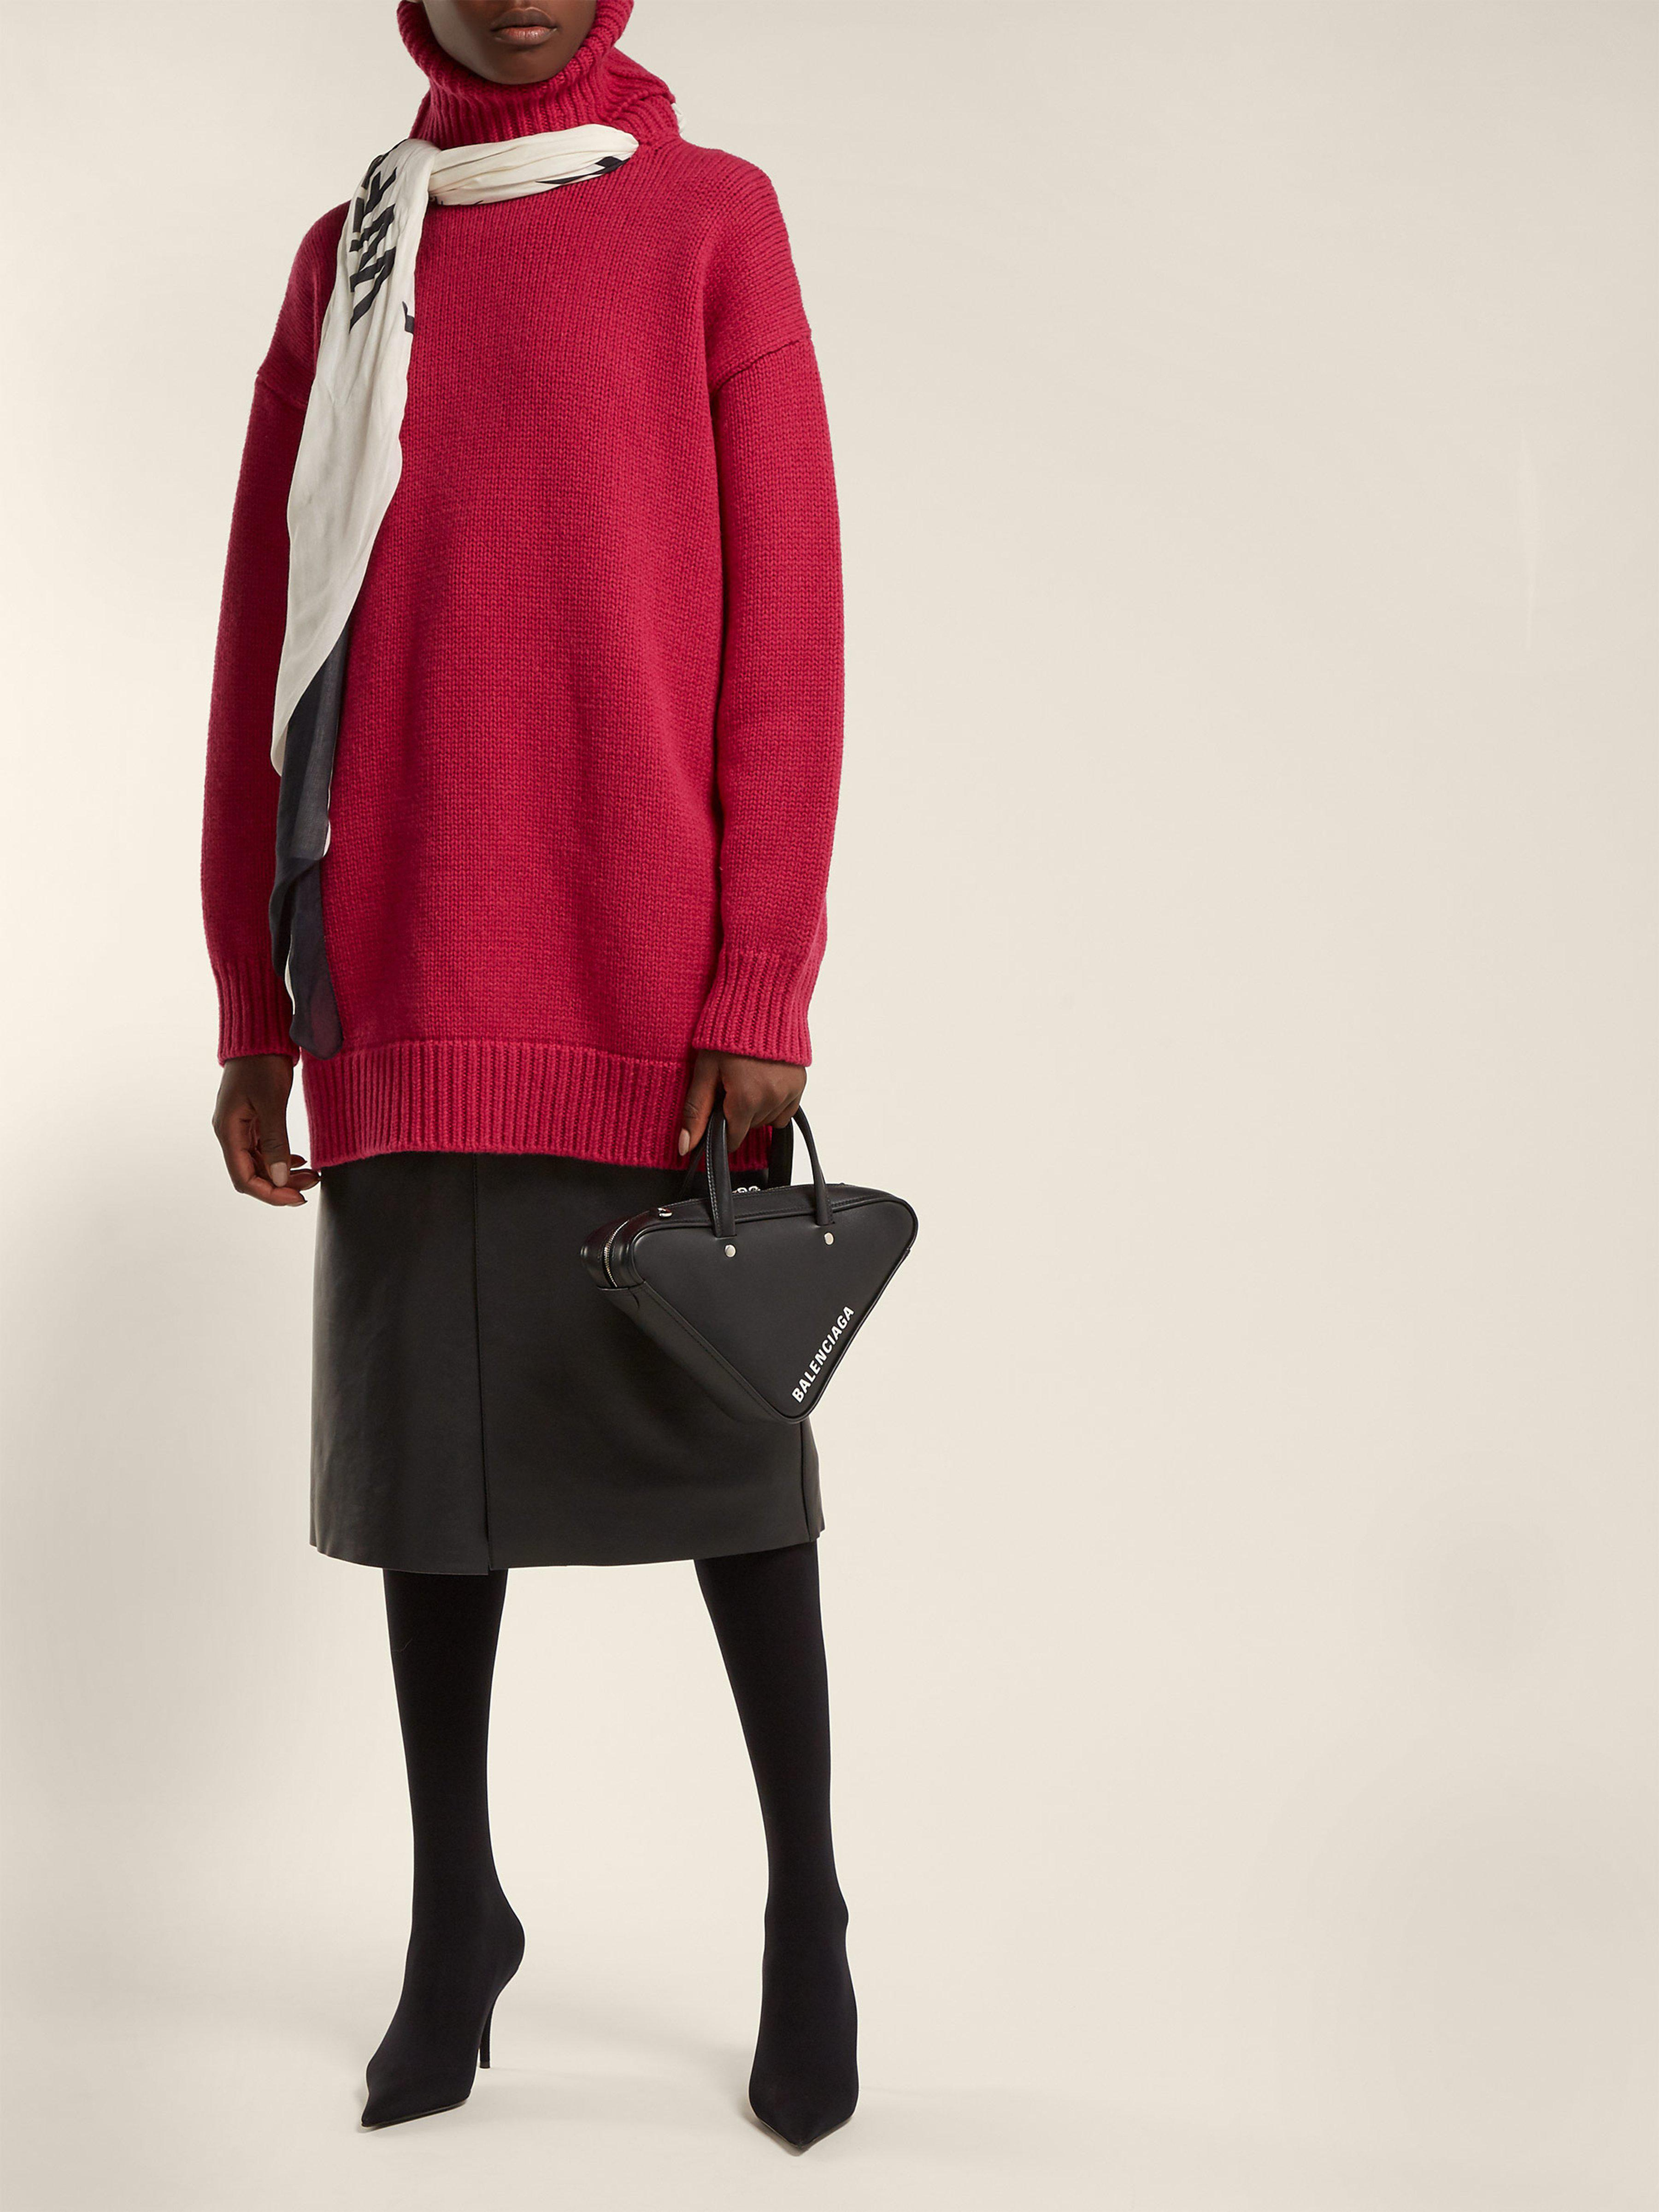 Balenciaga - Red Scarf Roll Neck Wool Sweater - Lyst. View fullscreen 8e8eb0d94